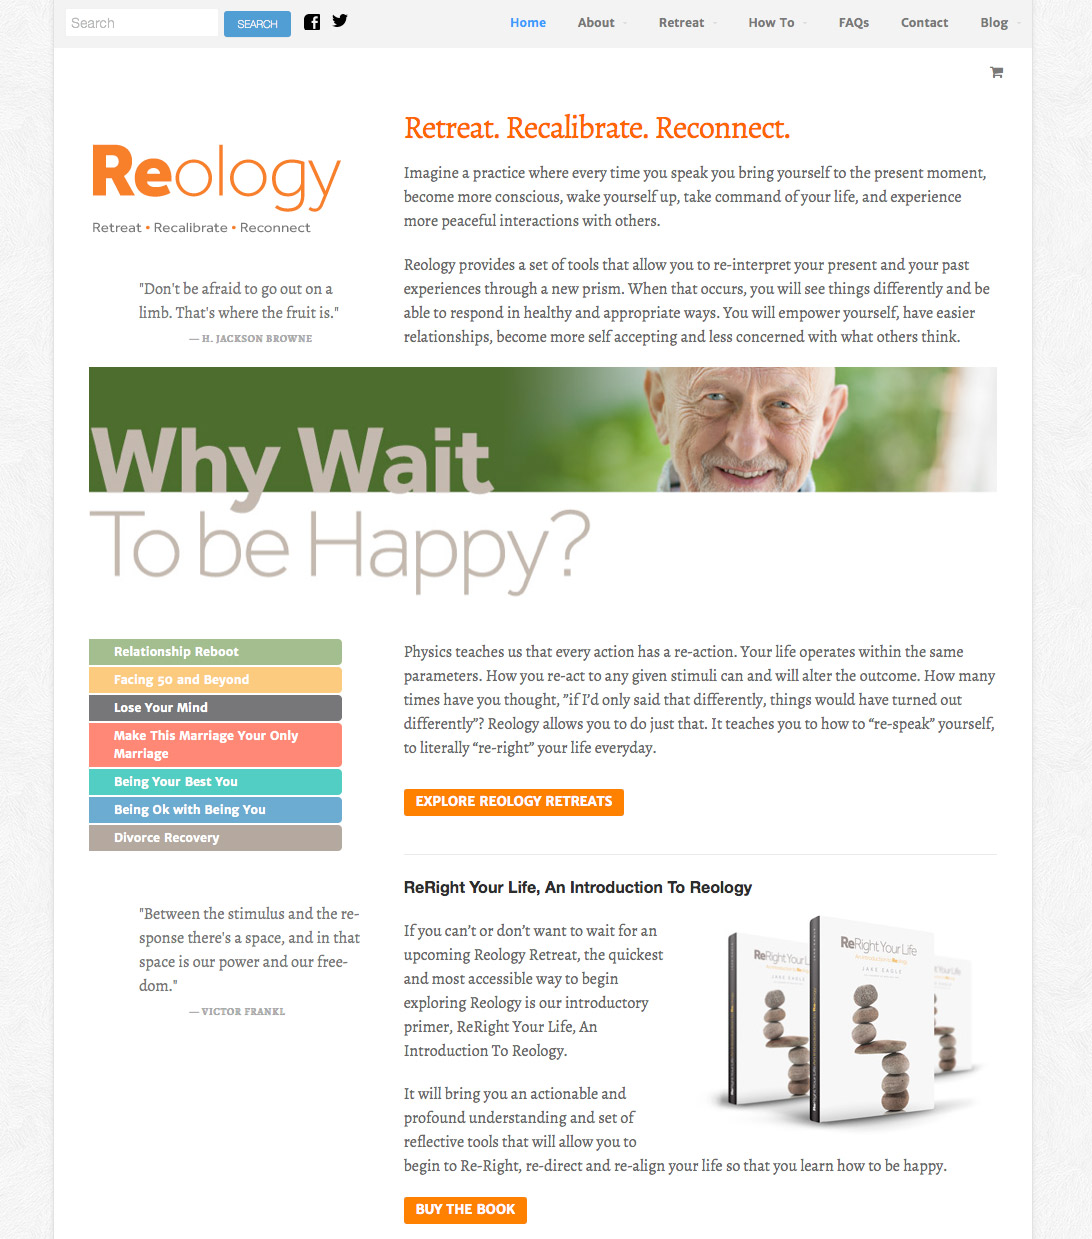 Mobile responsive website design for Reology.org